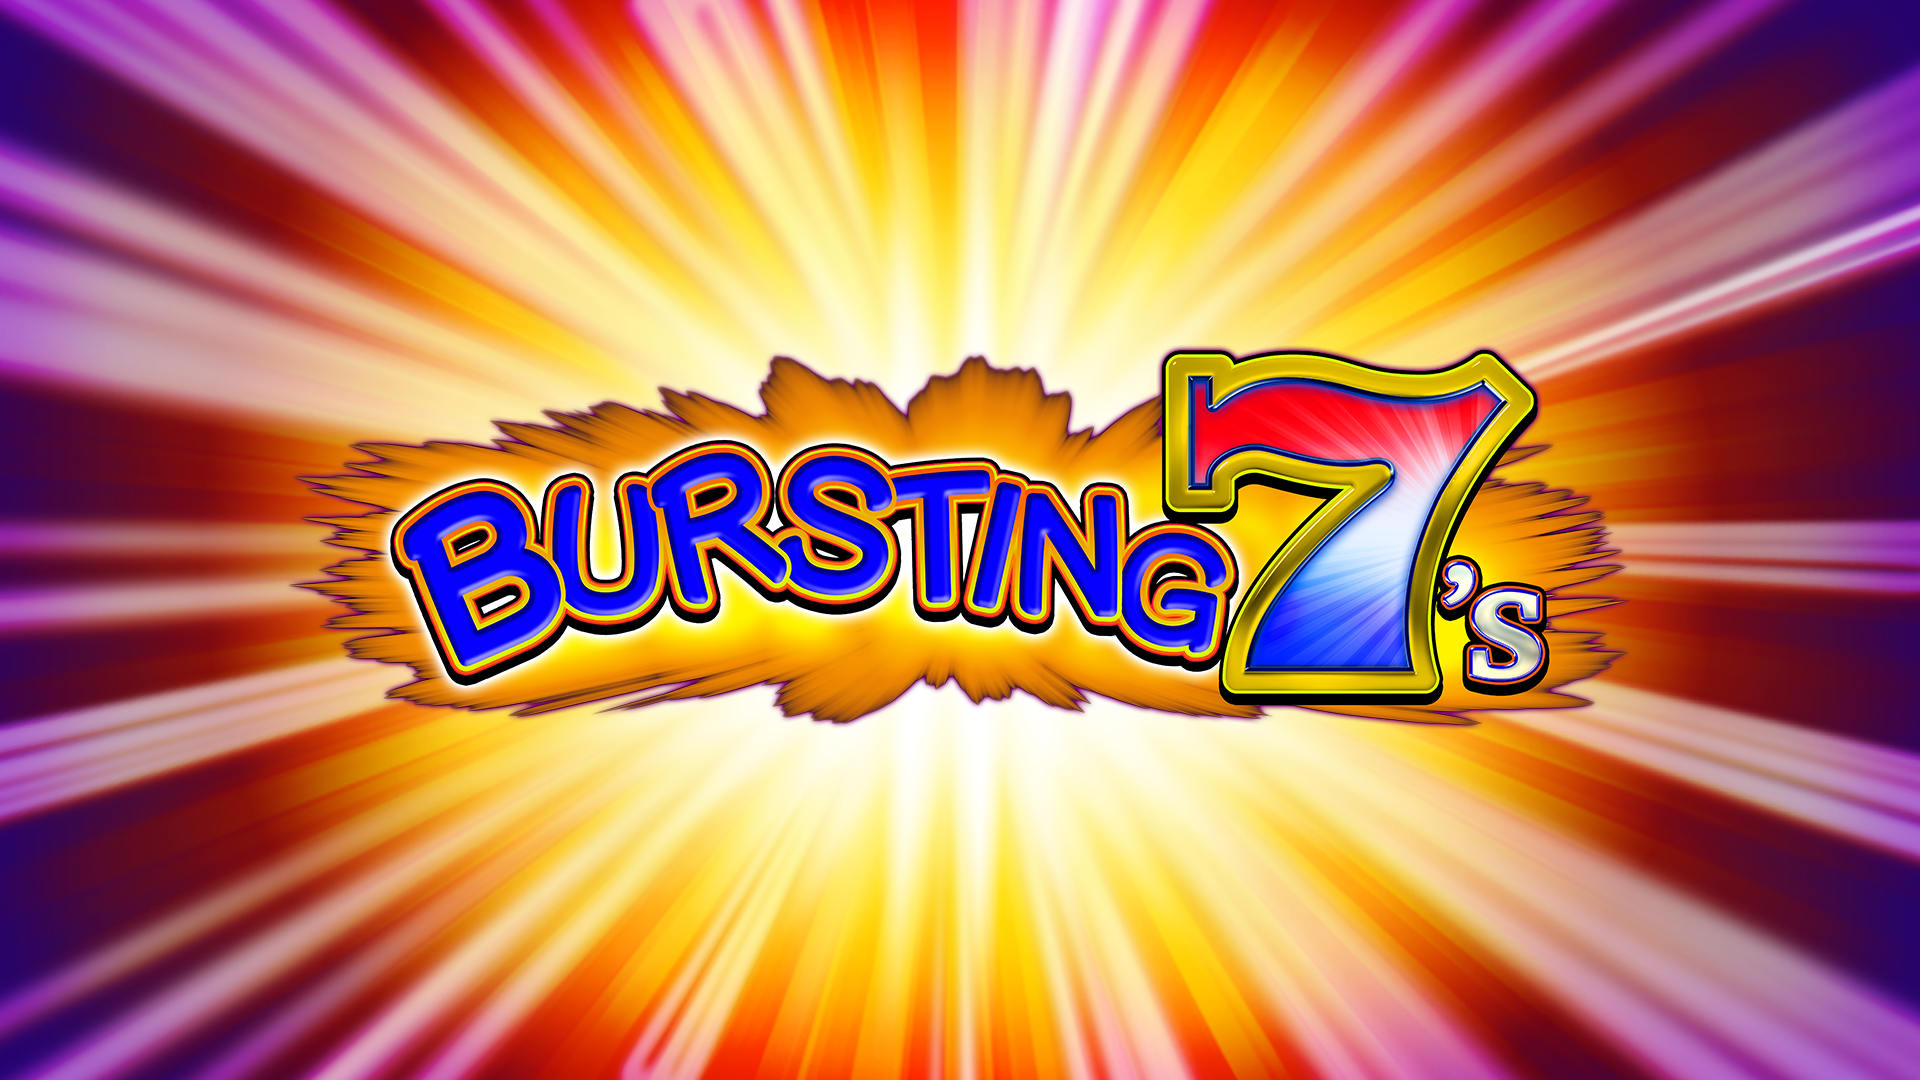 splash_screen_bursting_7s.png